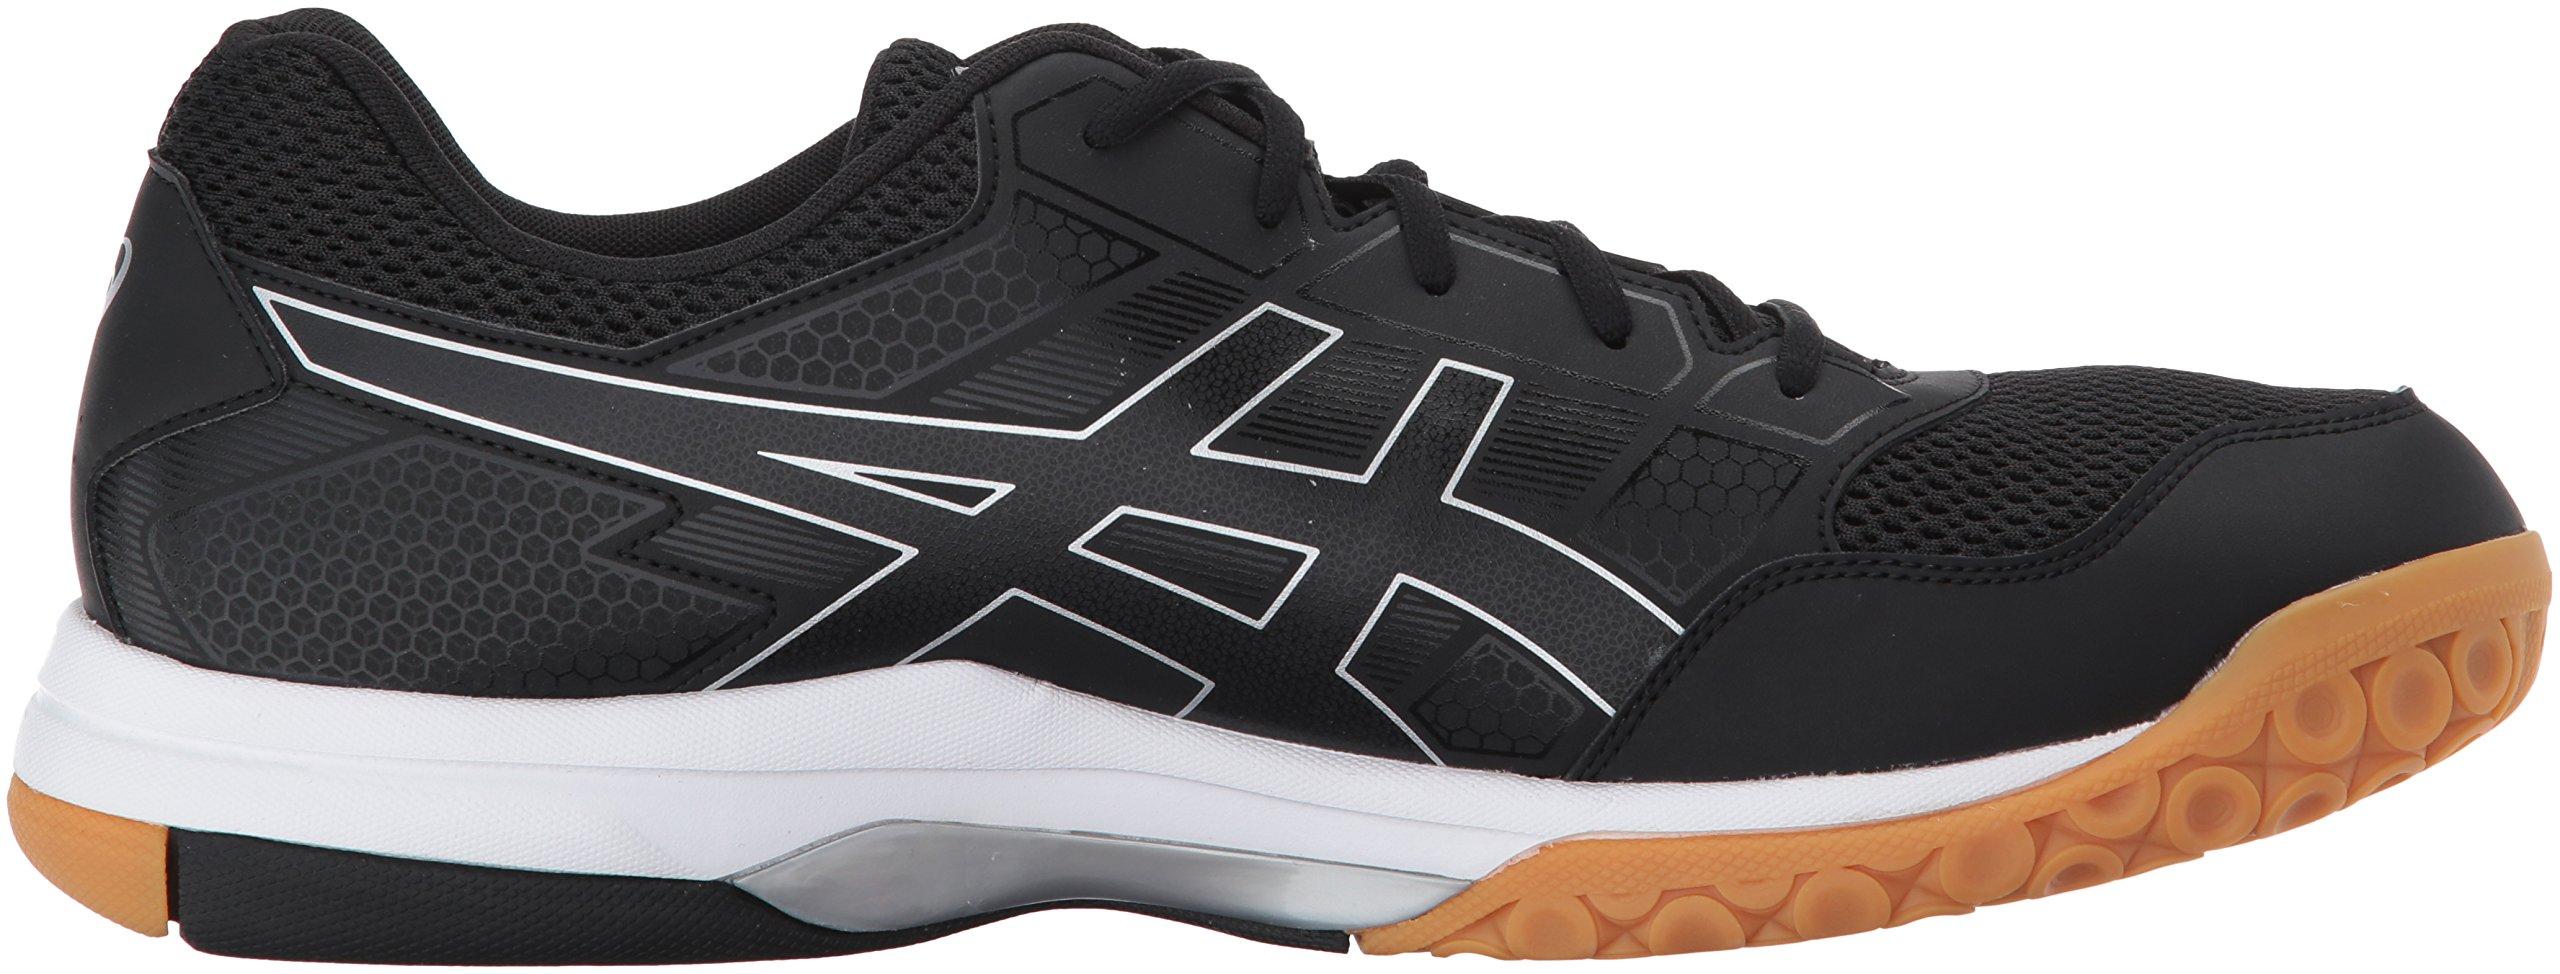 ASICS Mens Gel-Rocket 8 Volleyball Shoe Black/White, 7 Medium US by ASICS (Image #7)